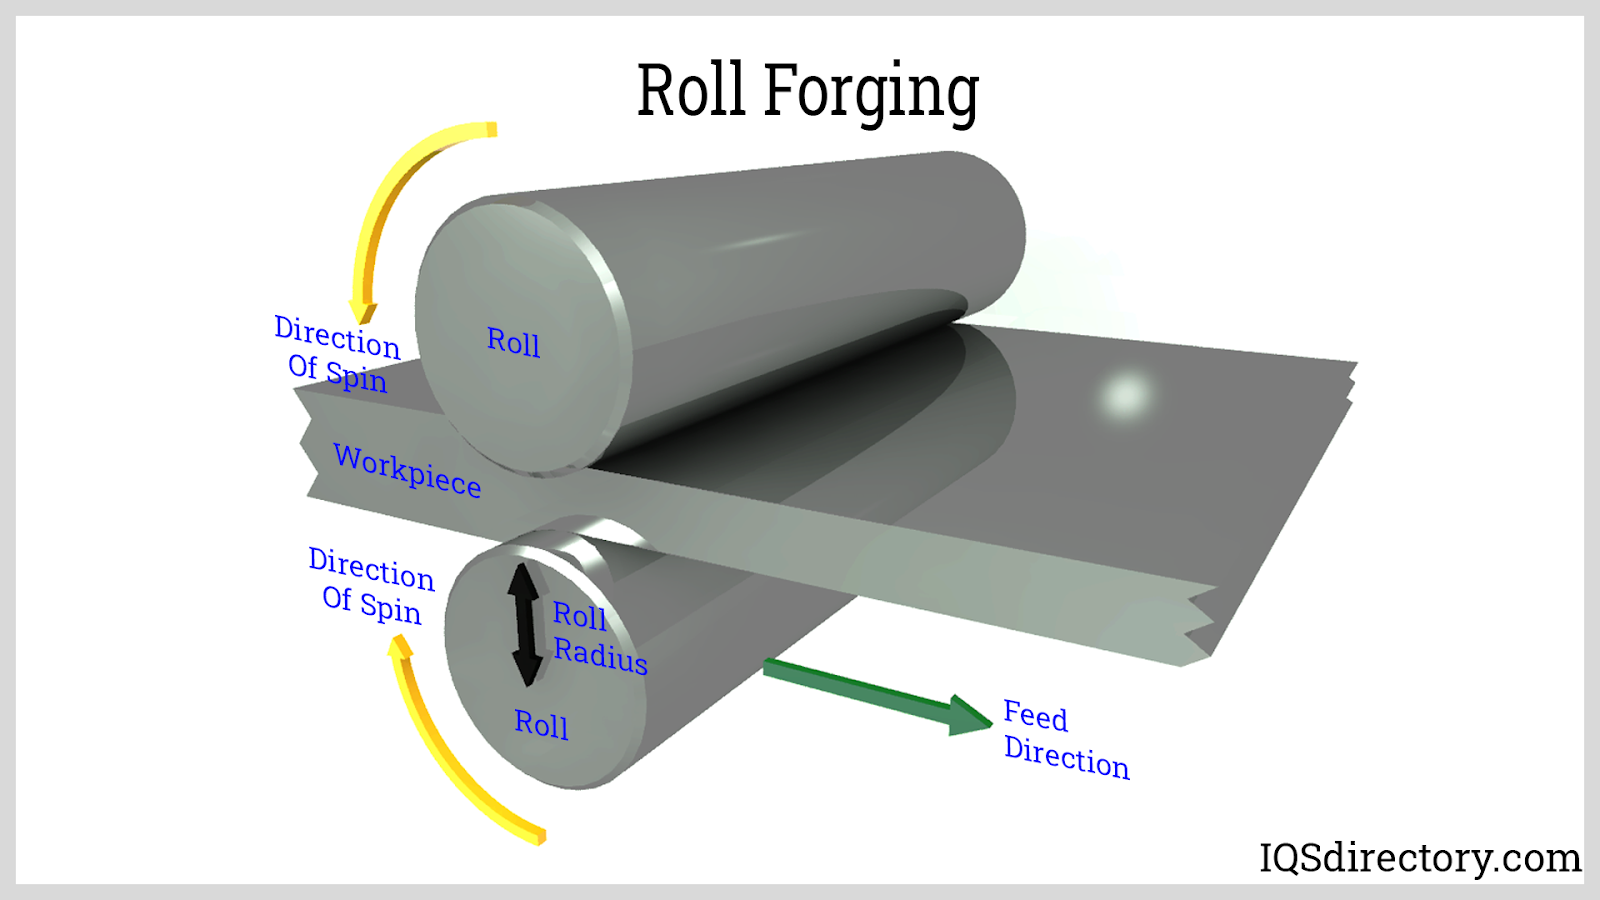 Roll Forging 2